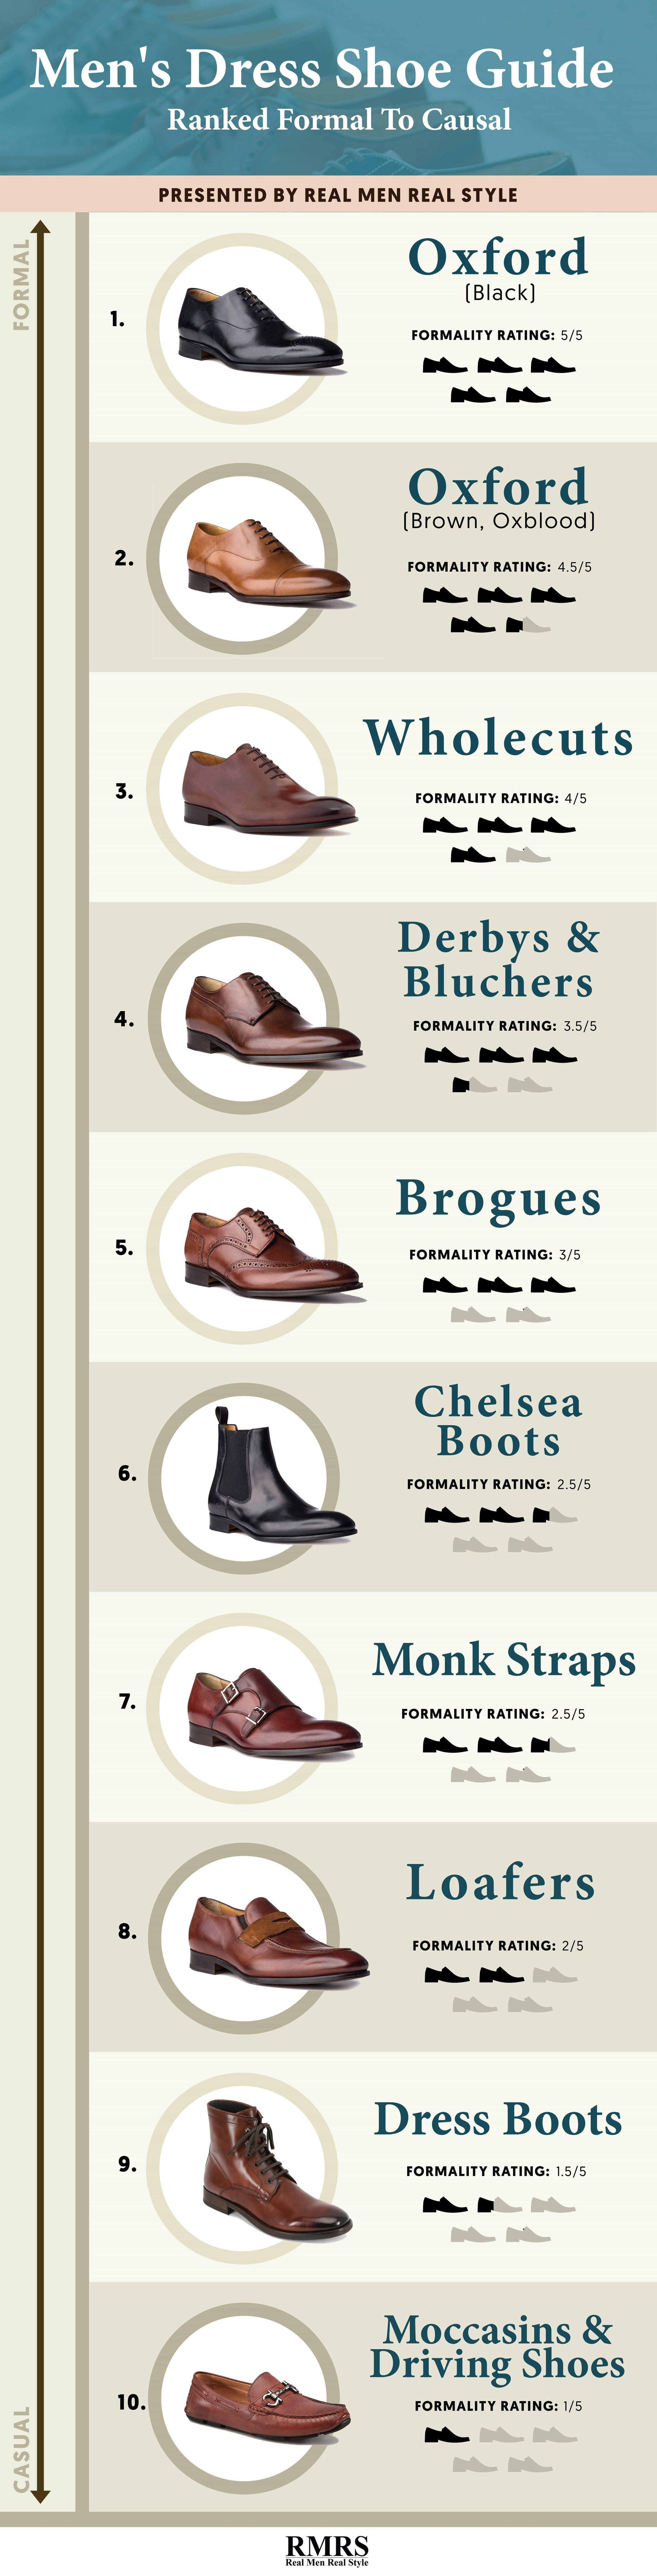 Men's Luggage Travel Tips